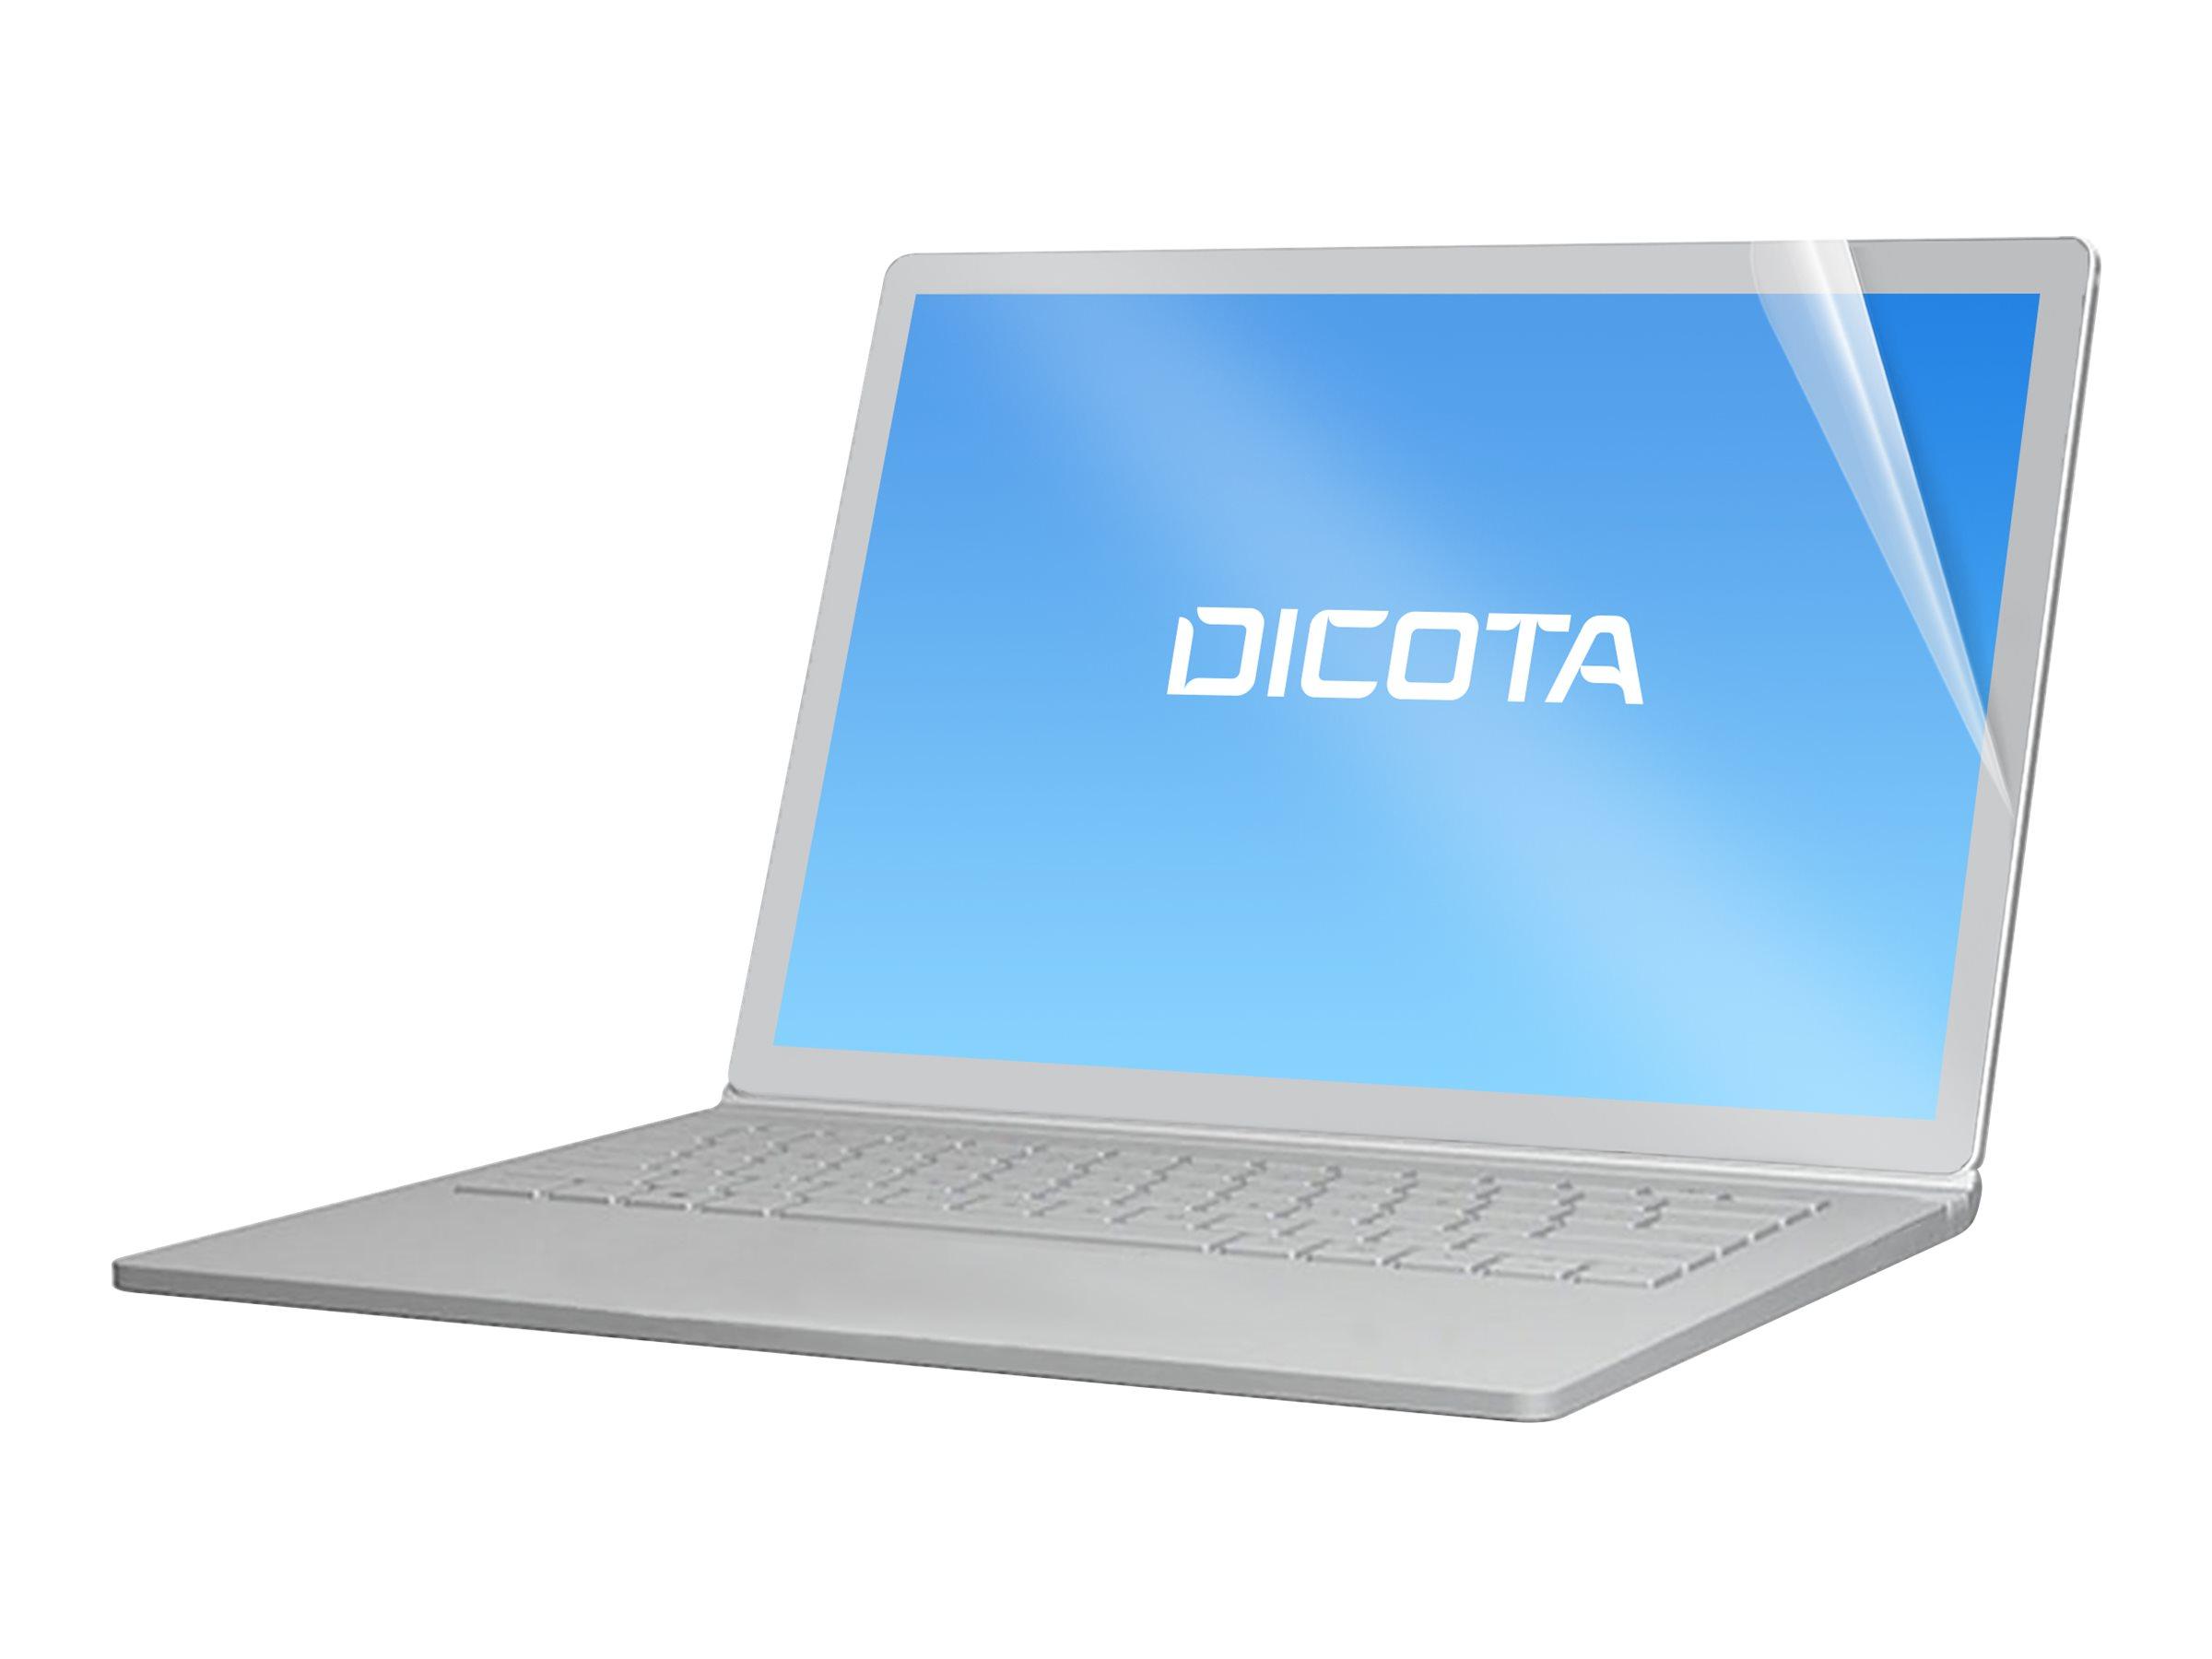 "Vorschau: Dicota Anti-Glare Filter 3H - Blendfreier Notebook-Filter - 38.1 cm (15"")"